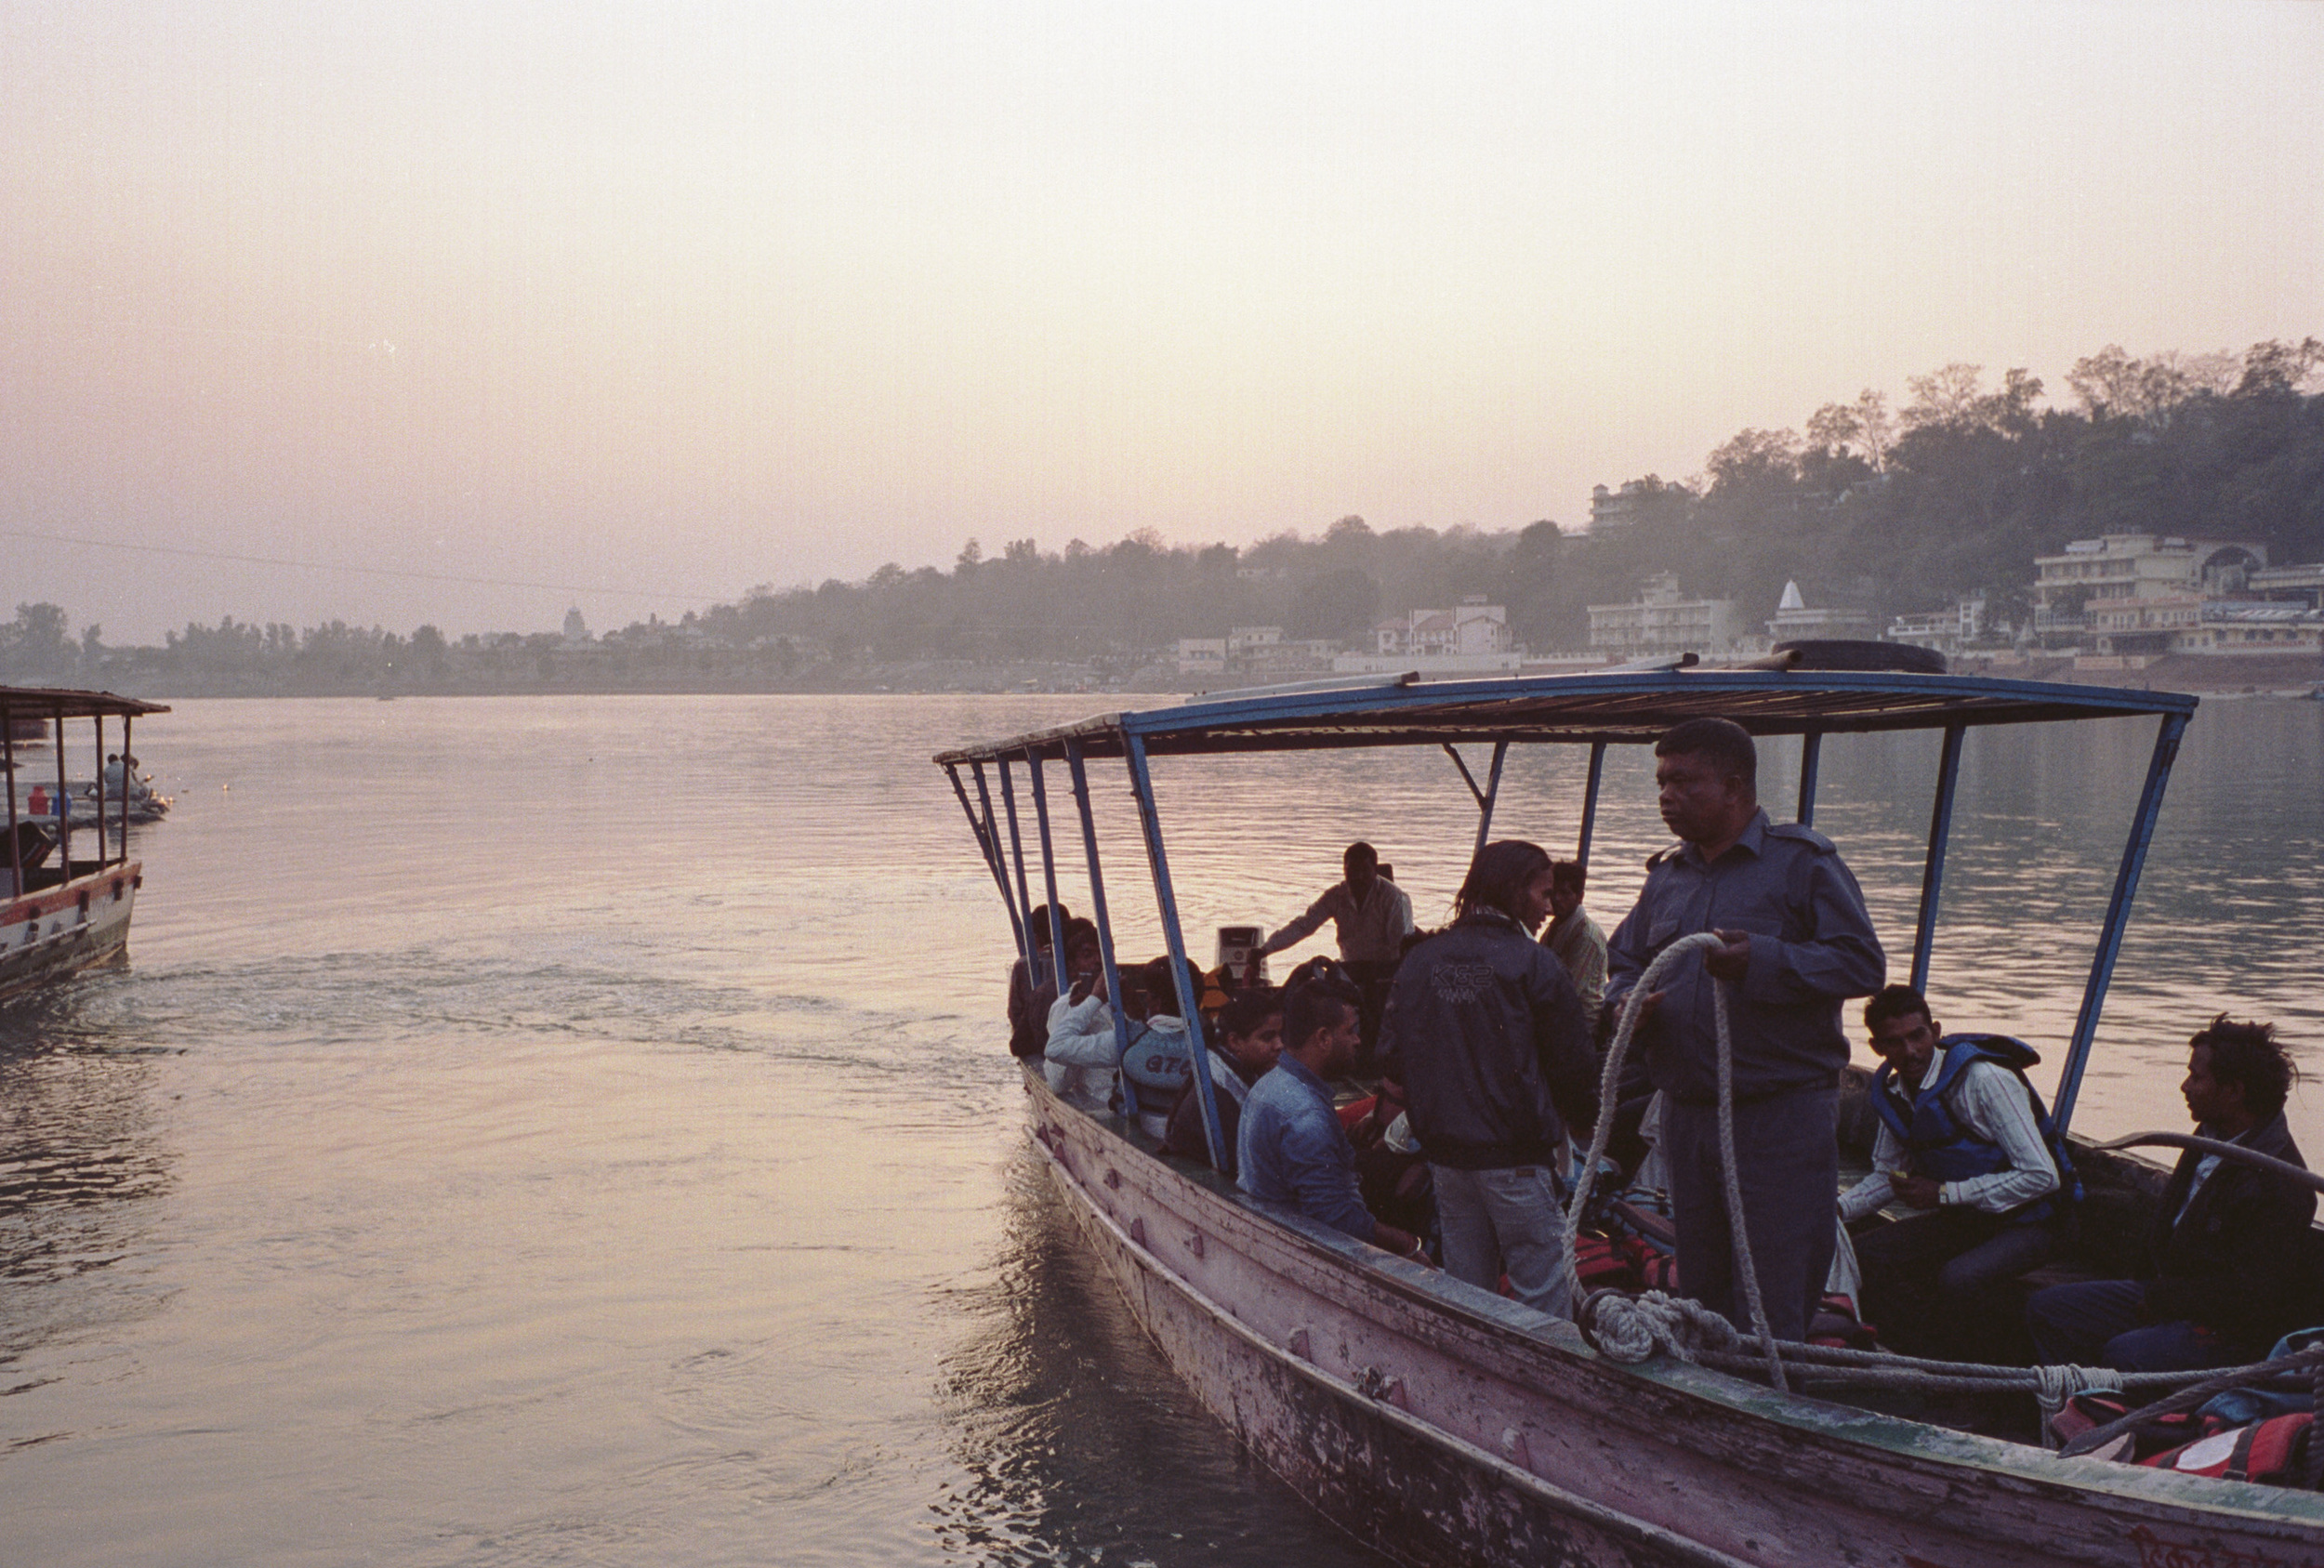 71-F35_Boat on Ganga, Rishikesh, India 2016-22.jpg